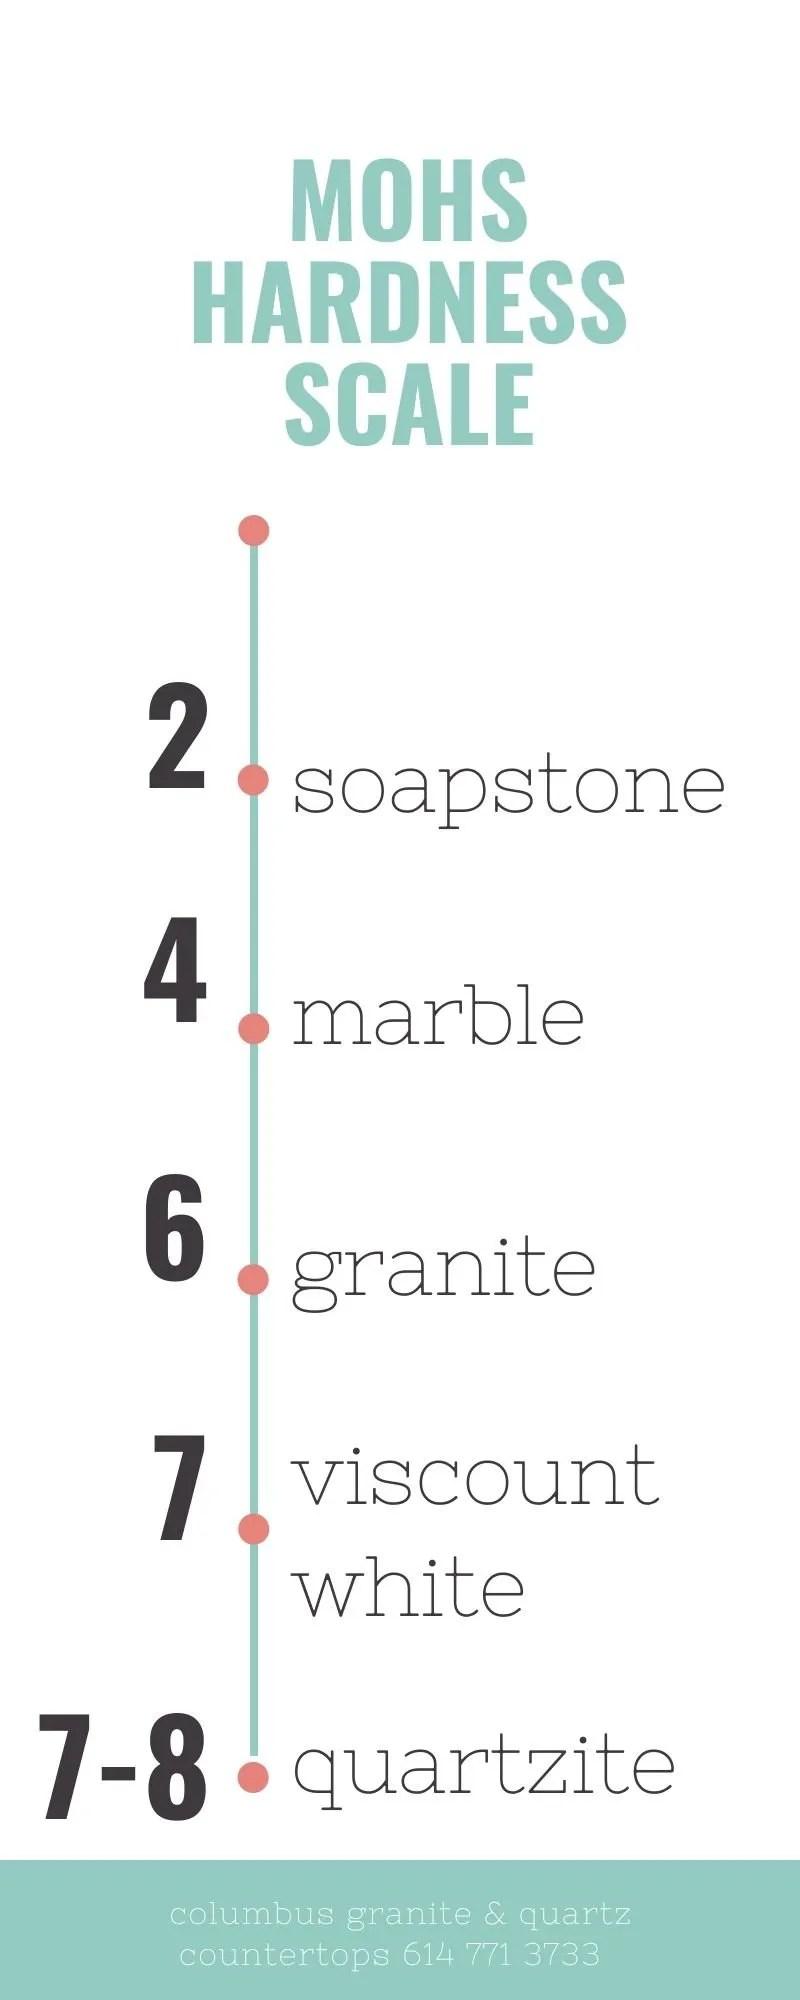 mohs hardness scale - Columbus Granite Kitchen Countertops